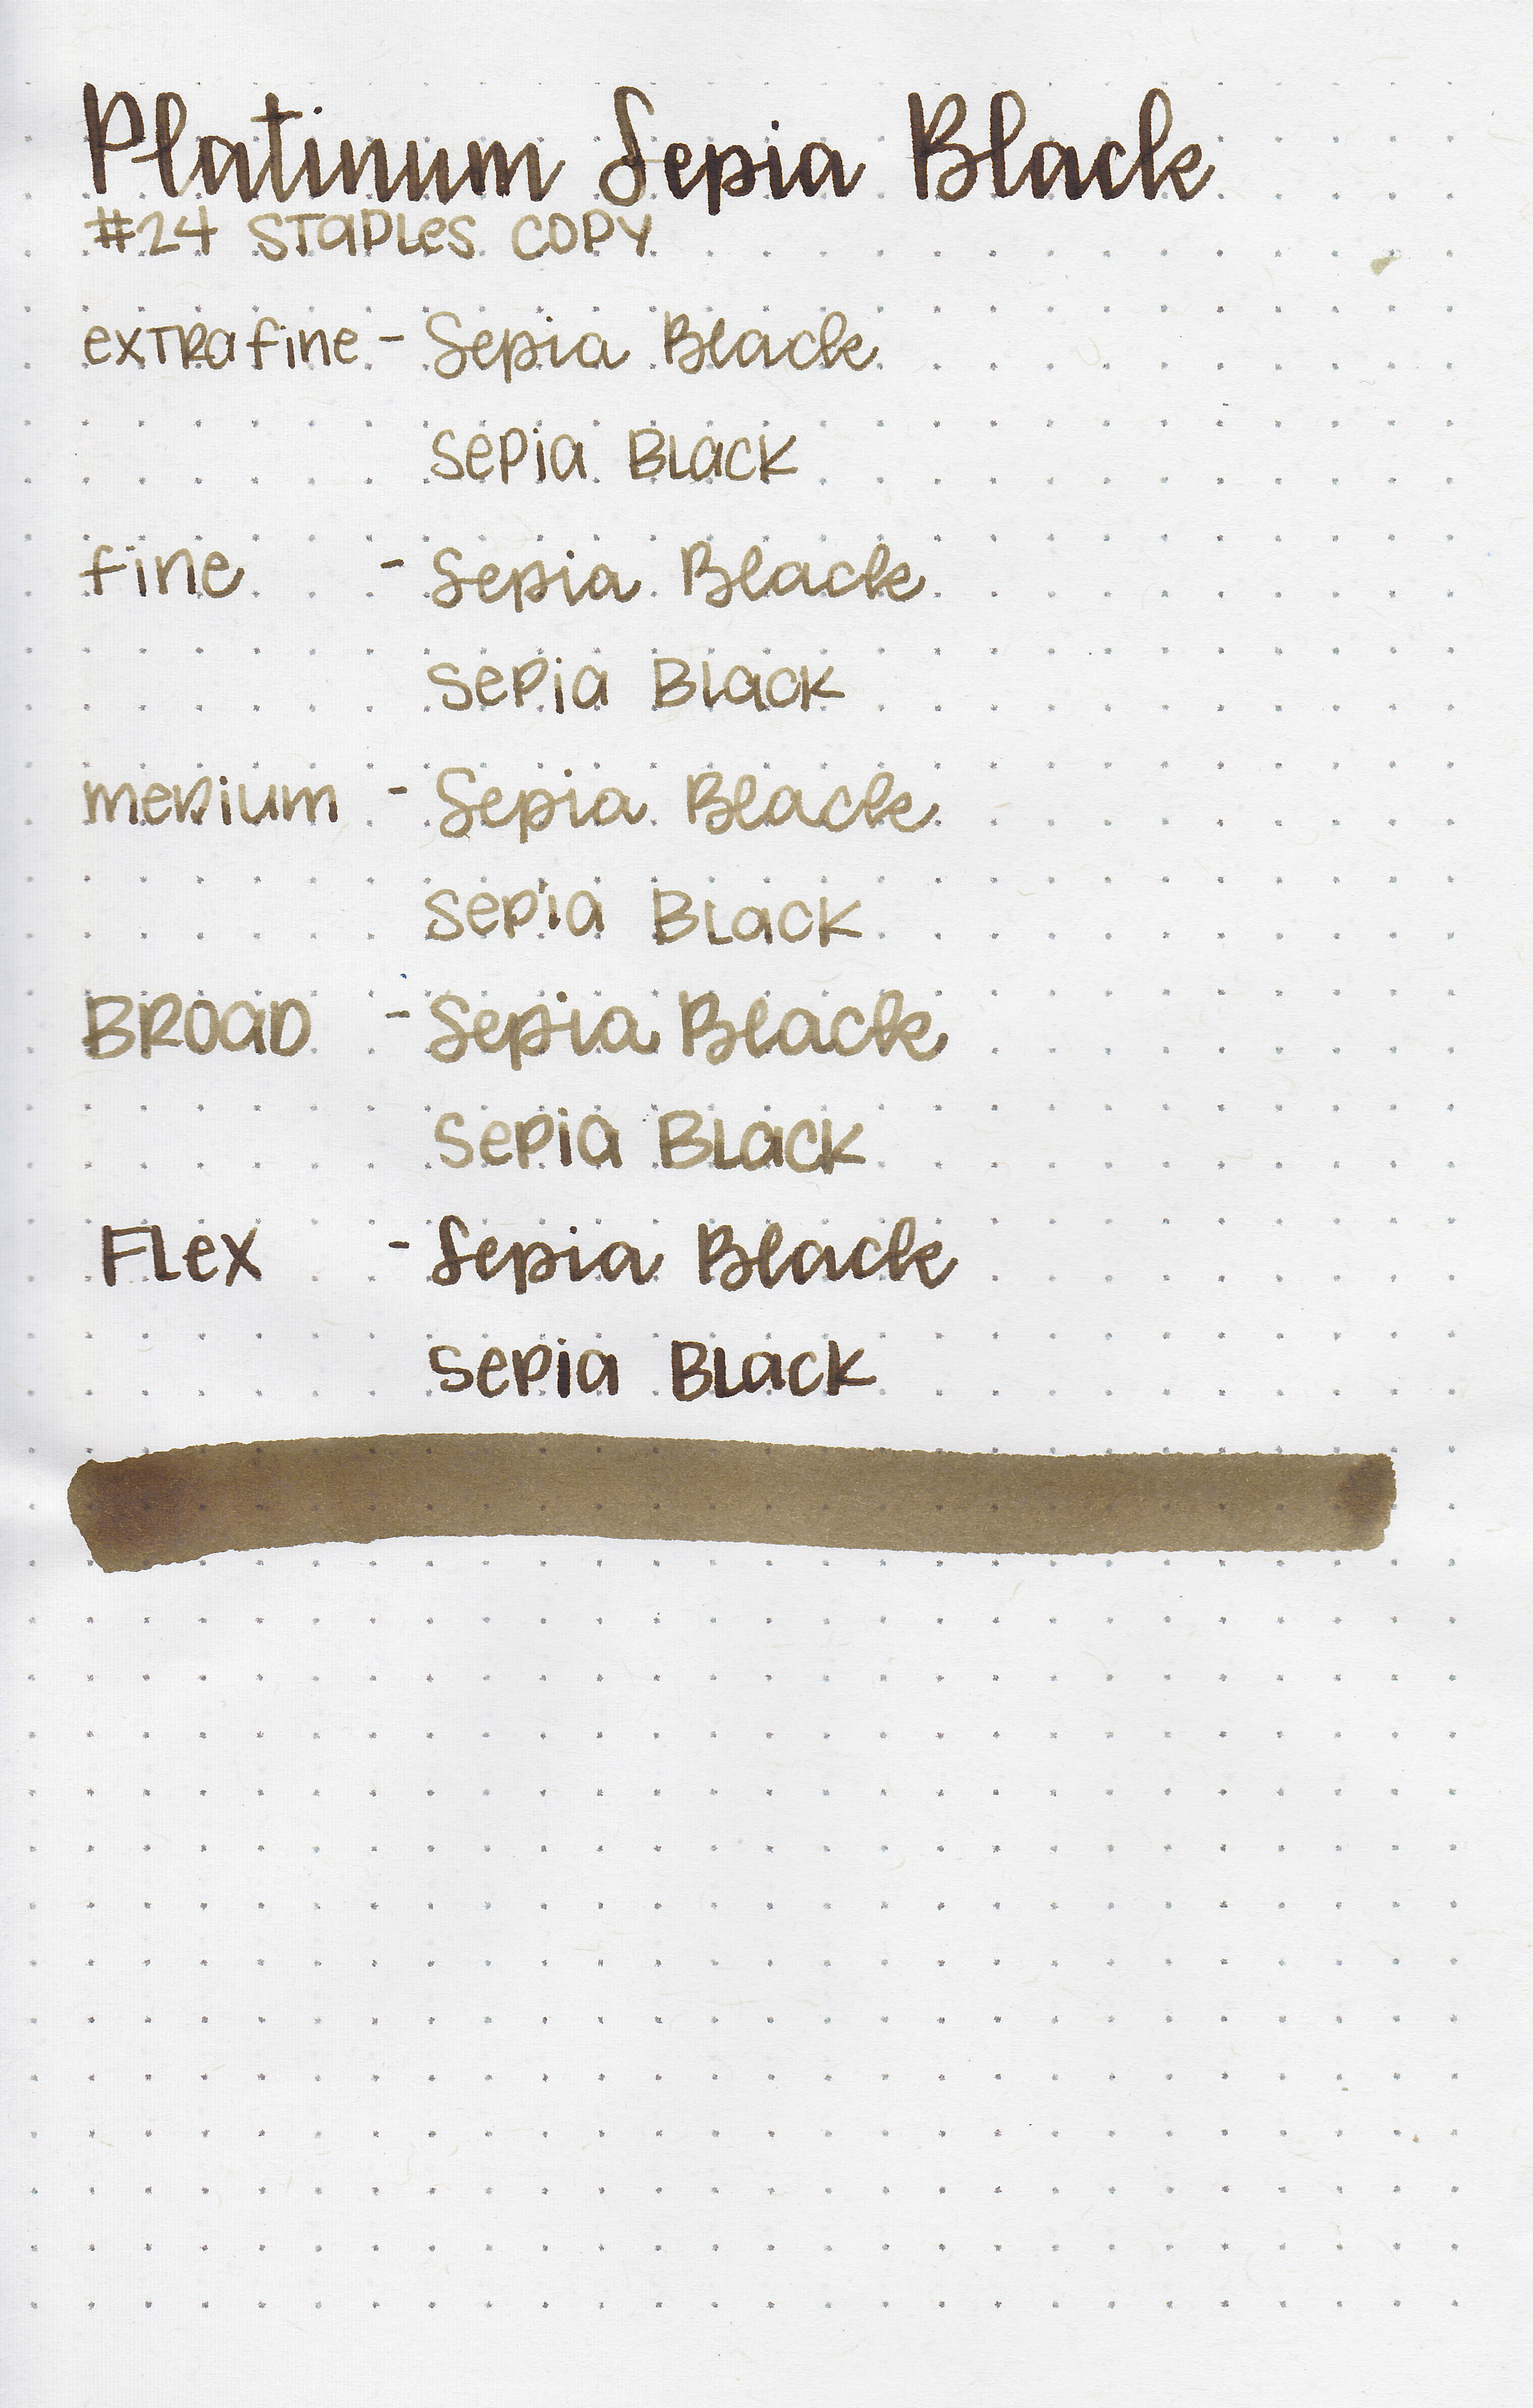 pl-sepia-black-11.jpg